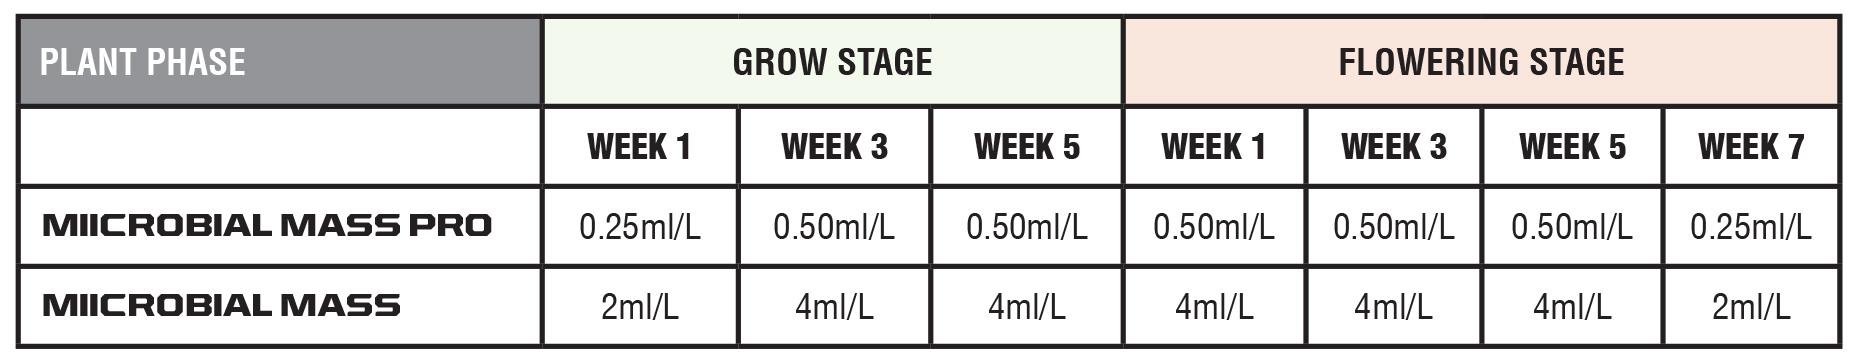 Miicrobial Mass Feeding Schedule